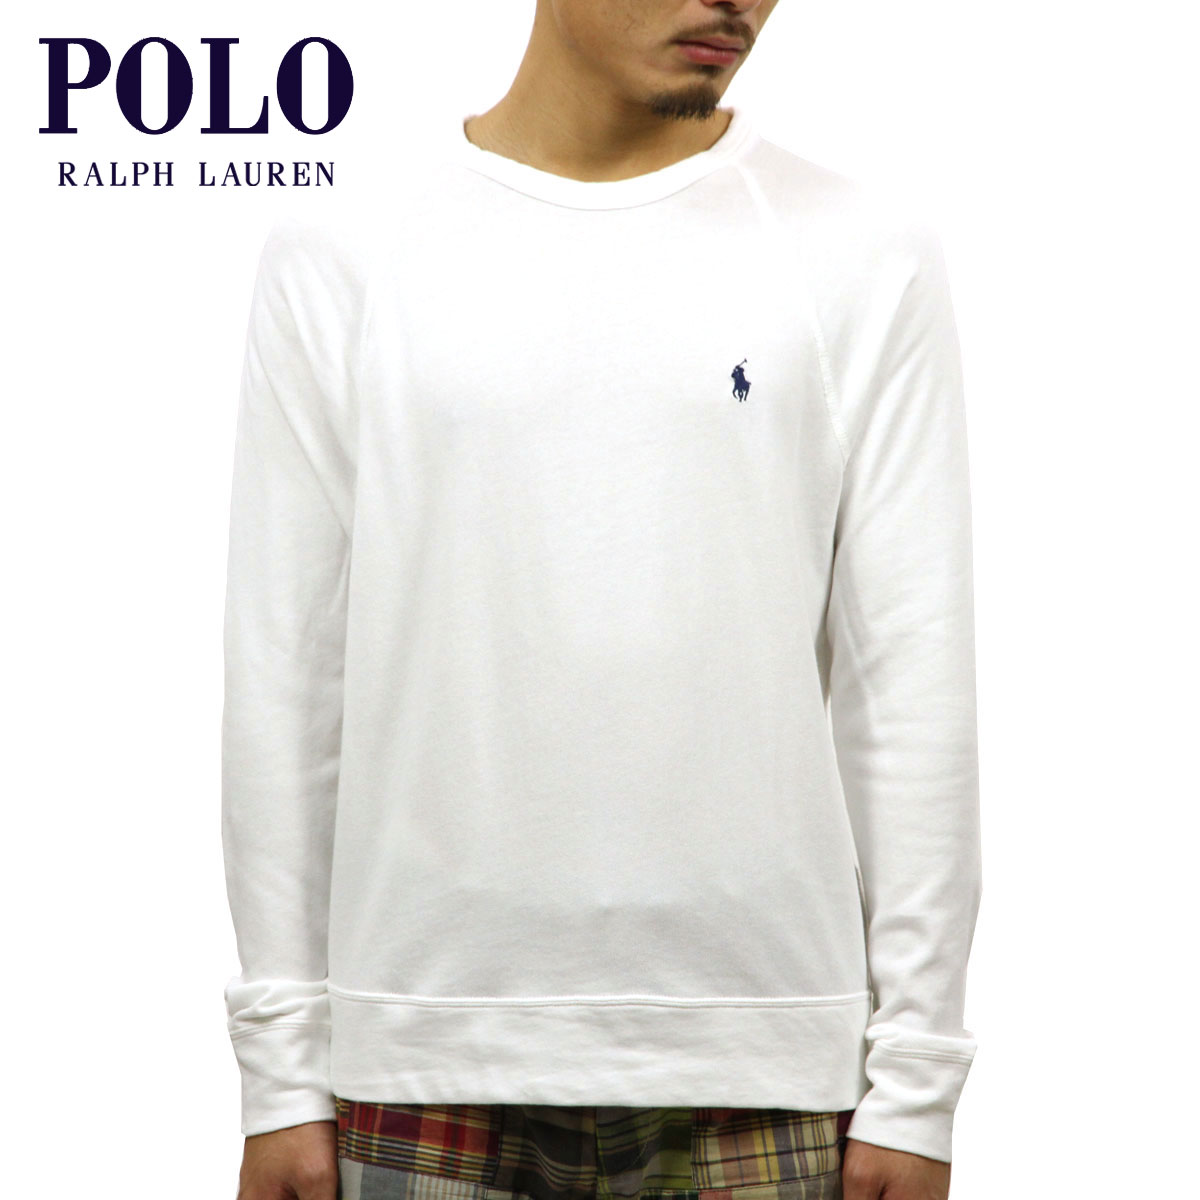 9008c46a6 Rakuten Ichiba shop MIXON  Polo Ralph Lauren POLO RALPH LAUREN regular  article men sweat shirt COTTON SPA TERRY SWEATSHIRT